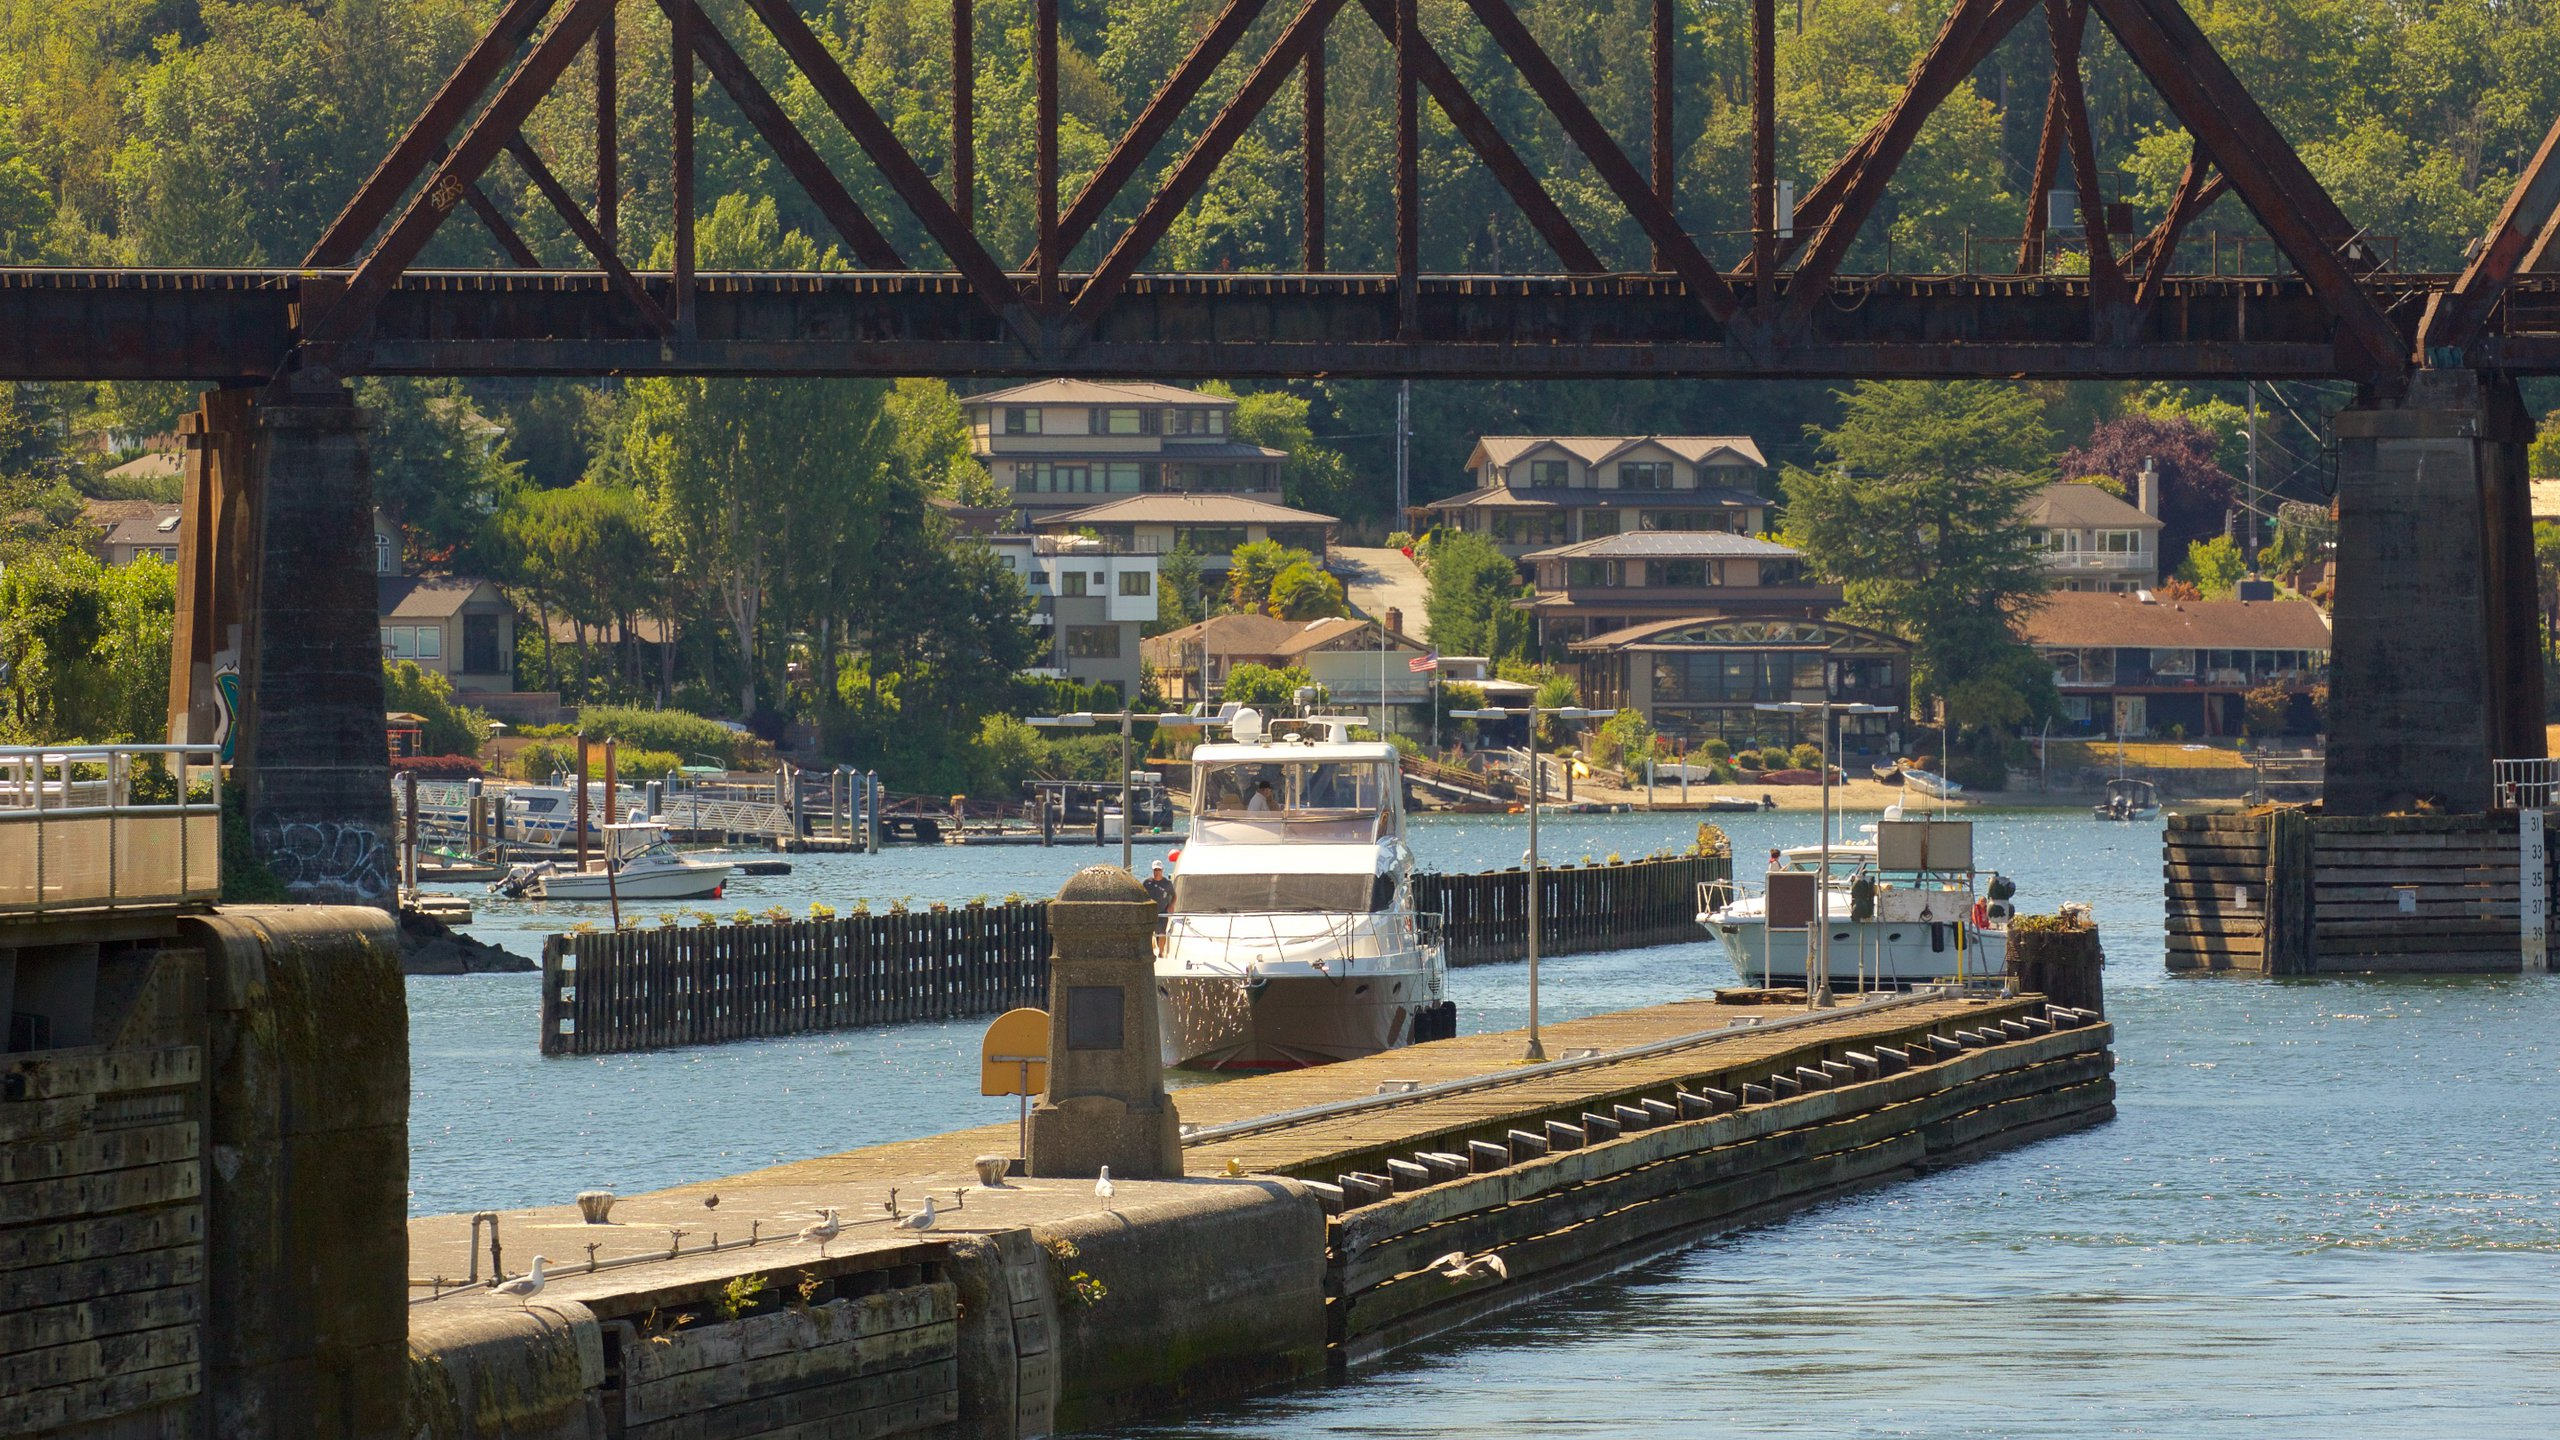 Old Ballard, Seattle, Washington, United States of America